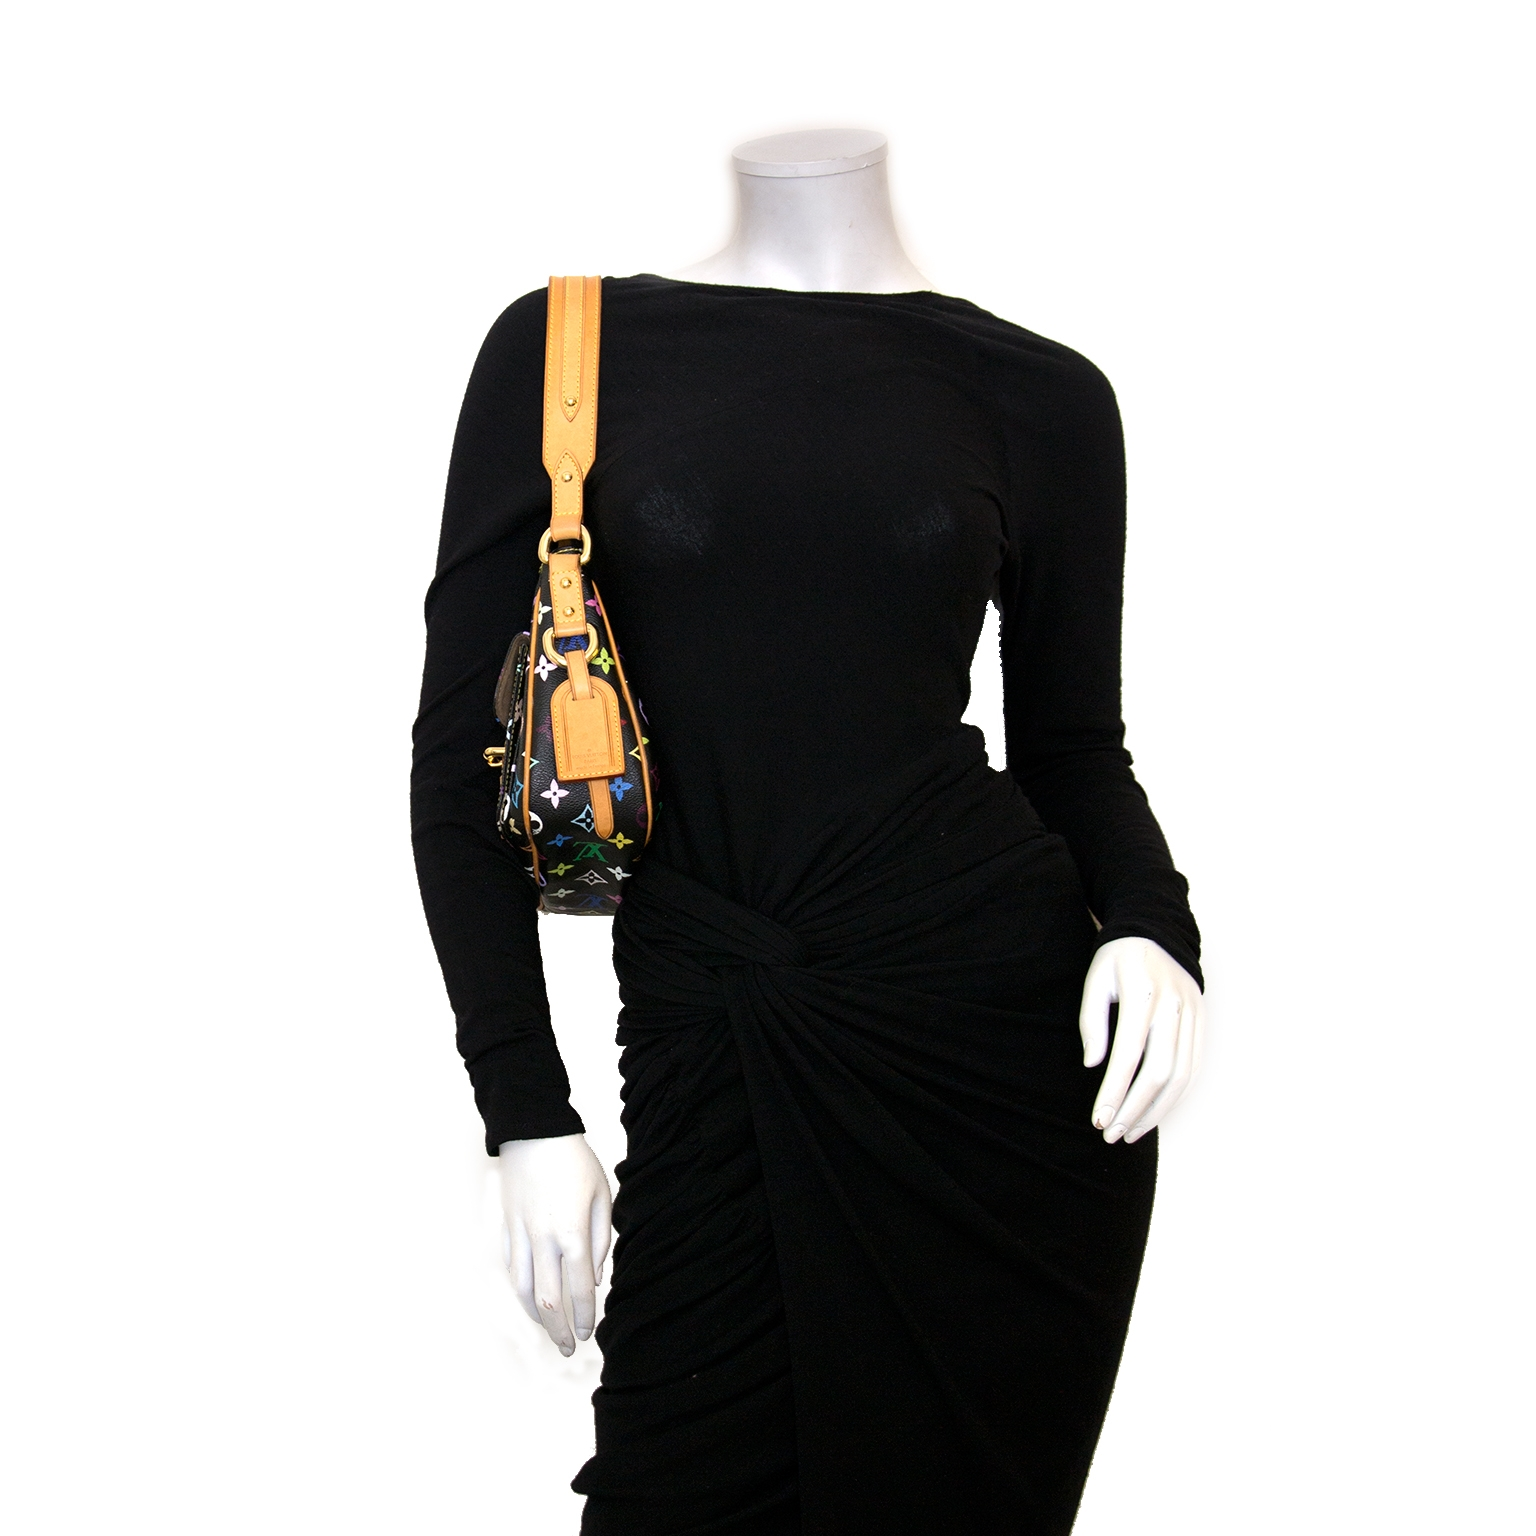 Louis Vuitton Black Monogram Multicolored Lodge Bag for sale online at Labellov